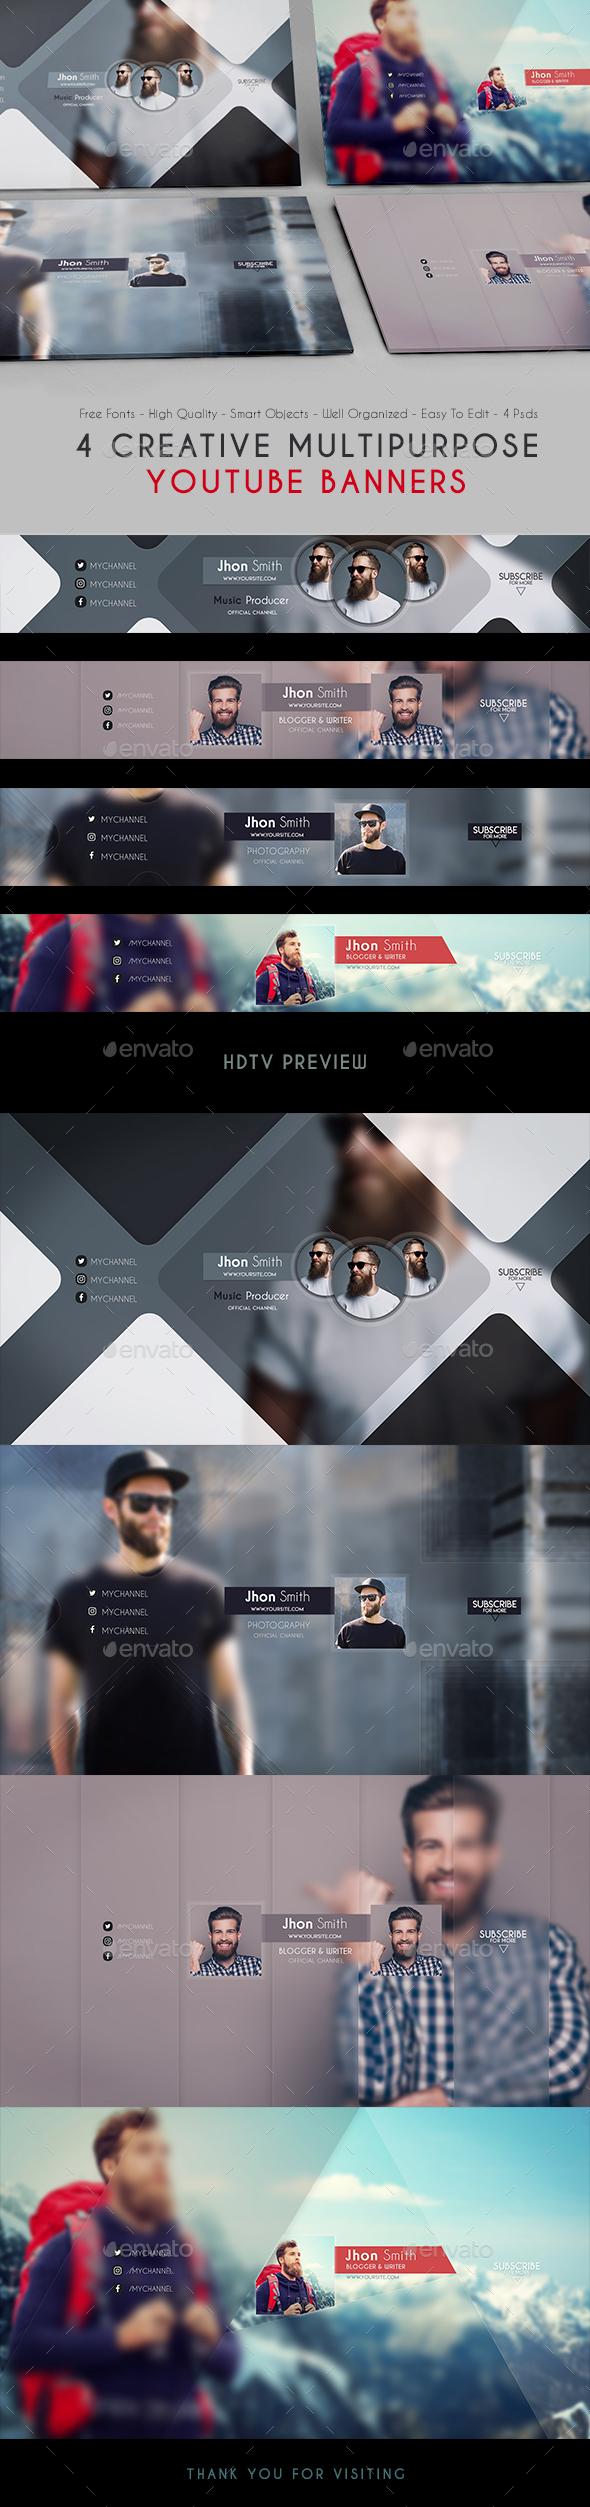 GraphicRiver Creative Multipurpose YouTube Banners 21086002